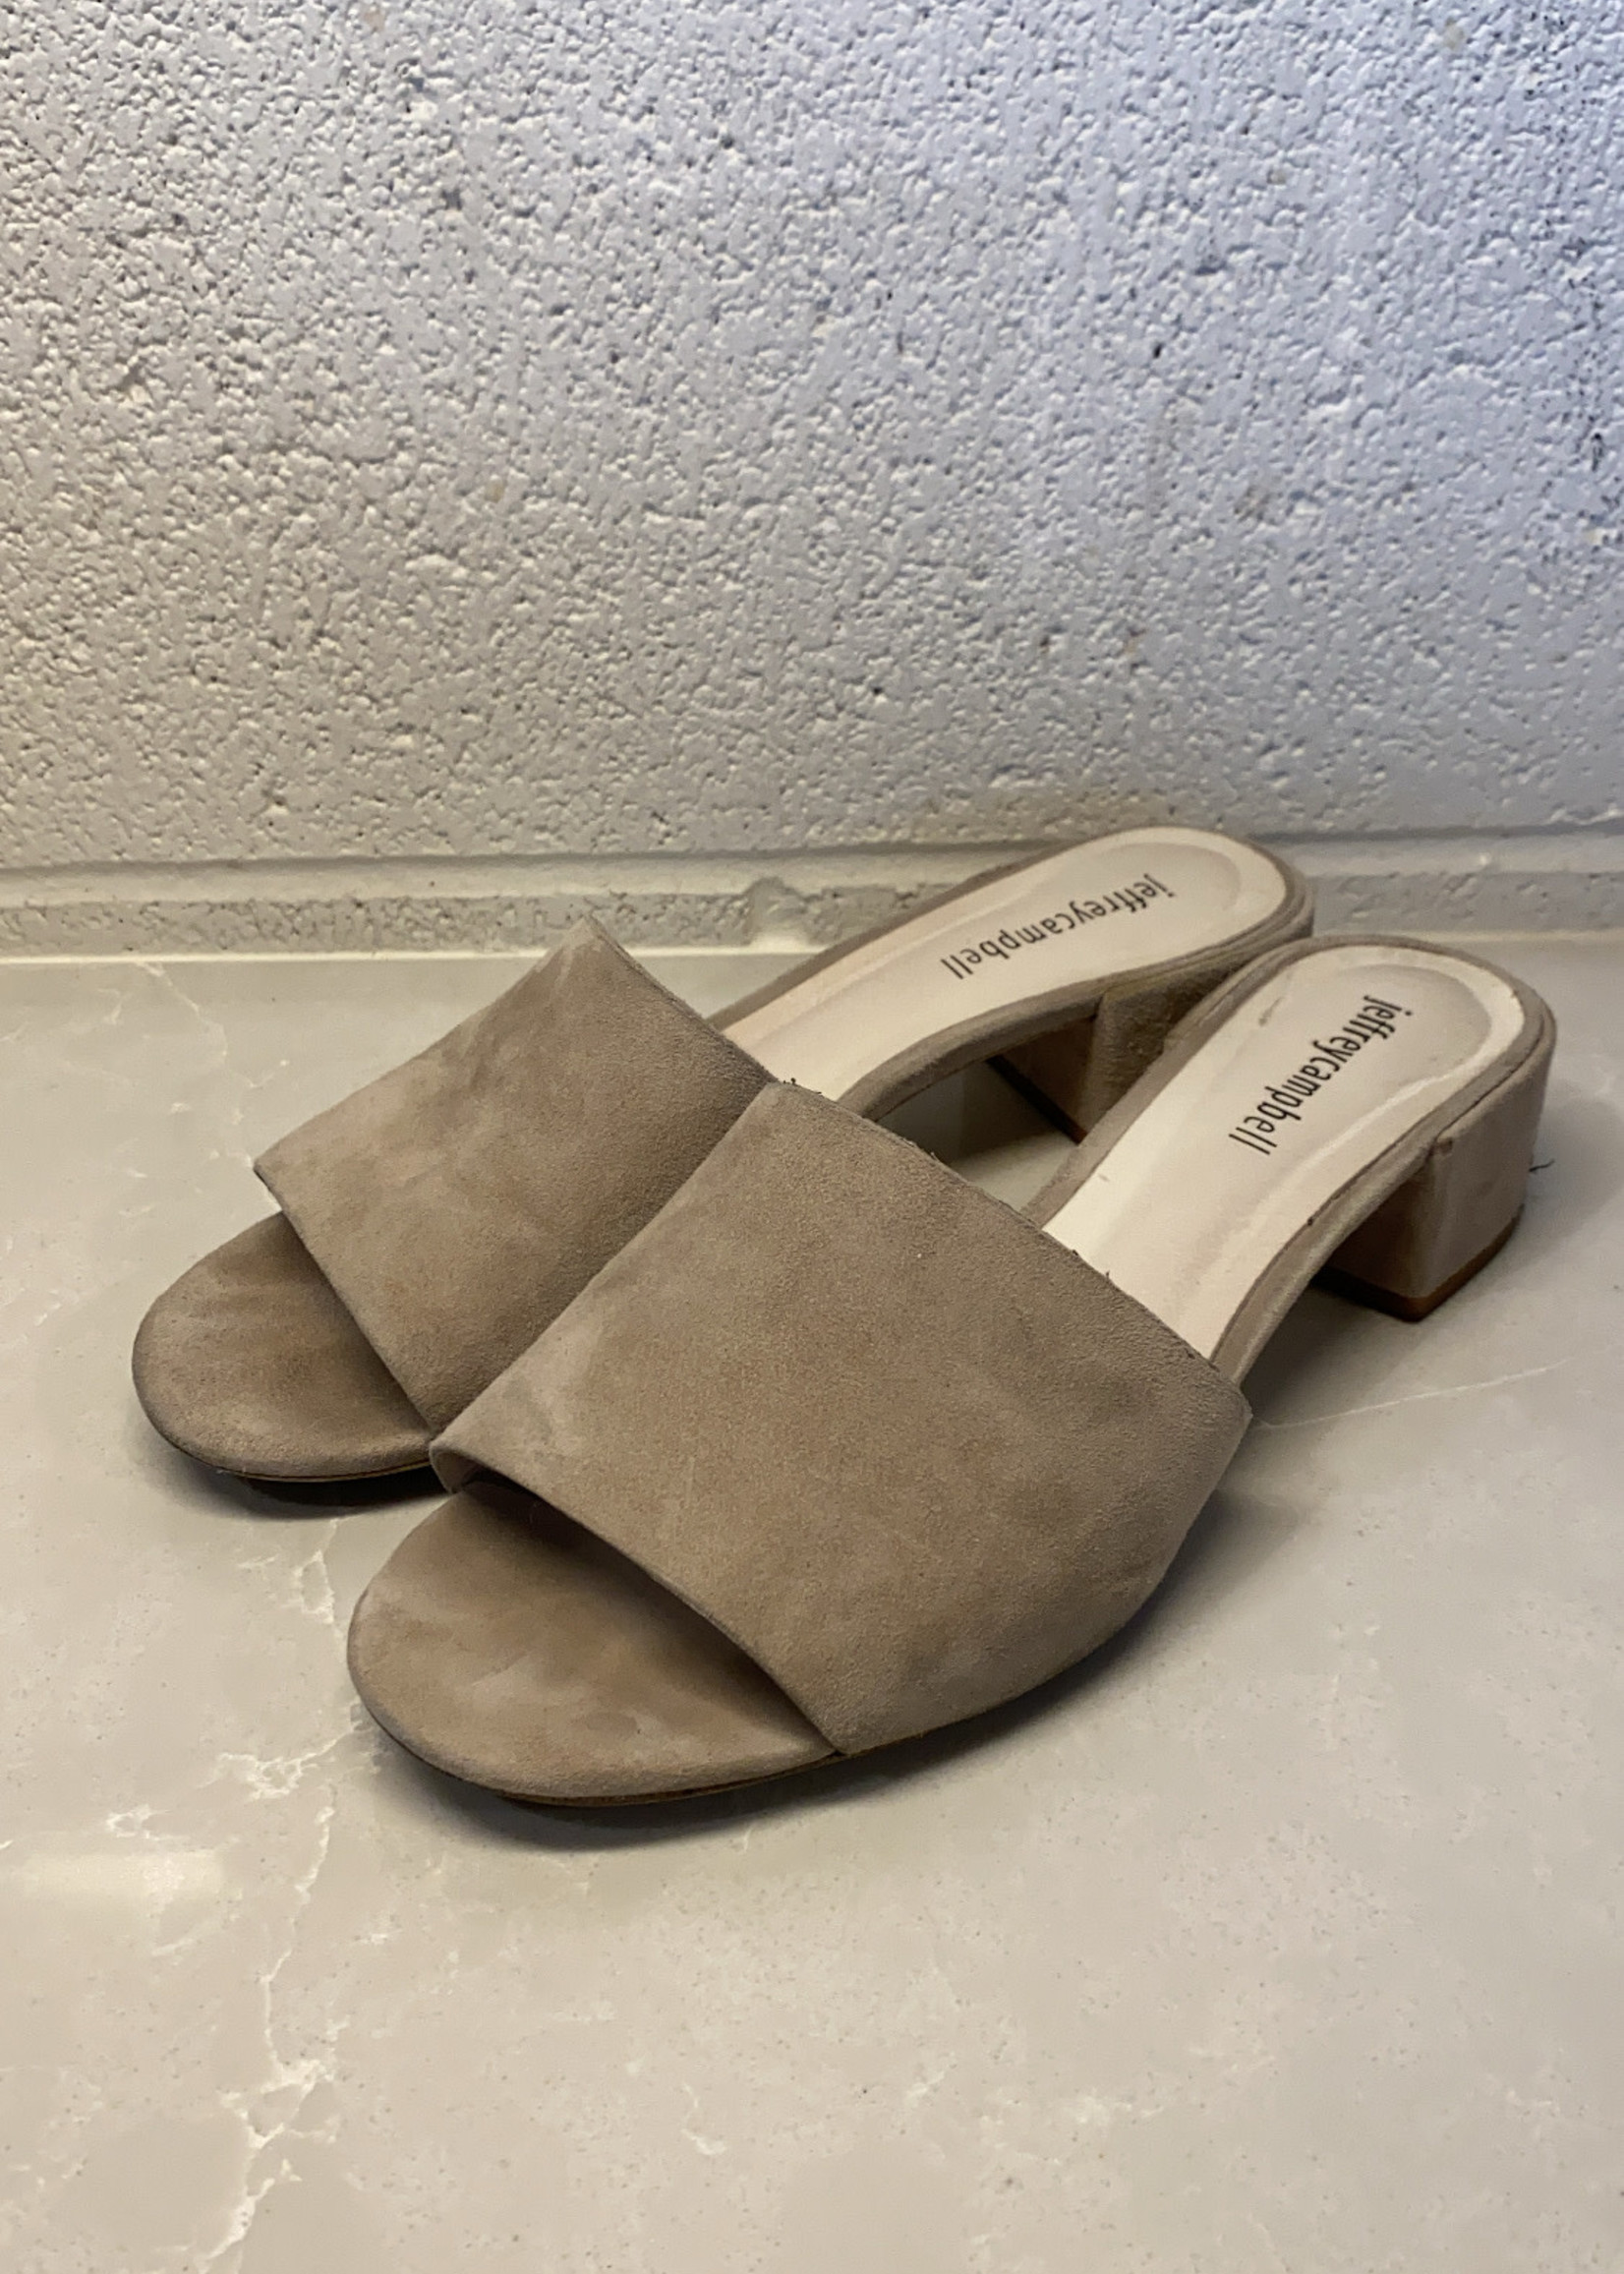 Jeffrey Campbell grey low heel sandal 8.5